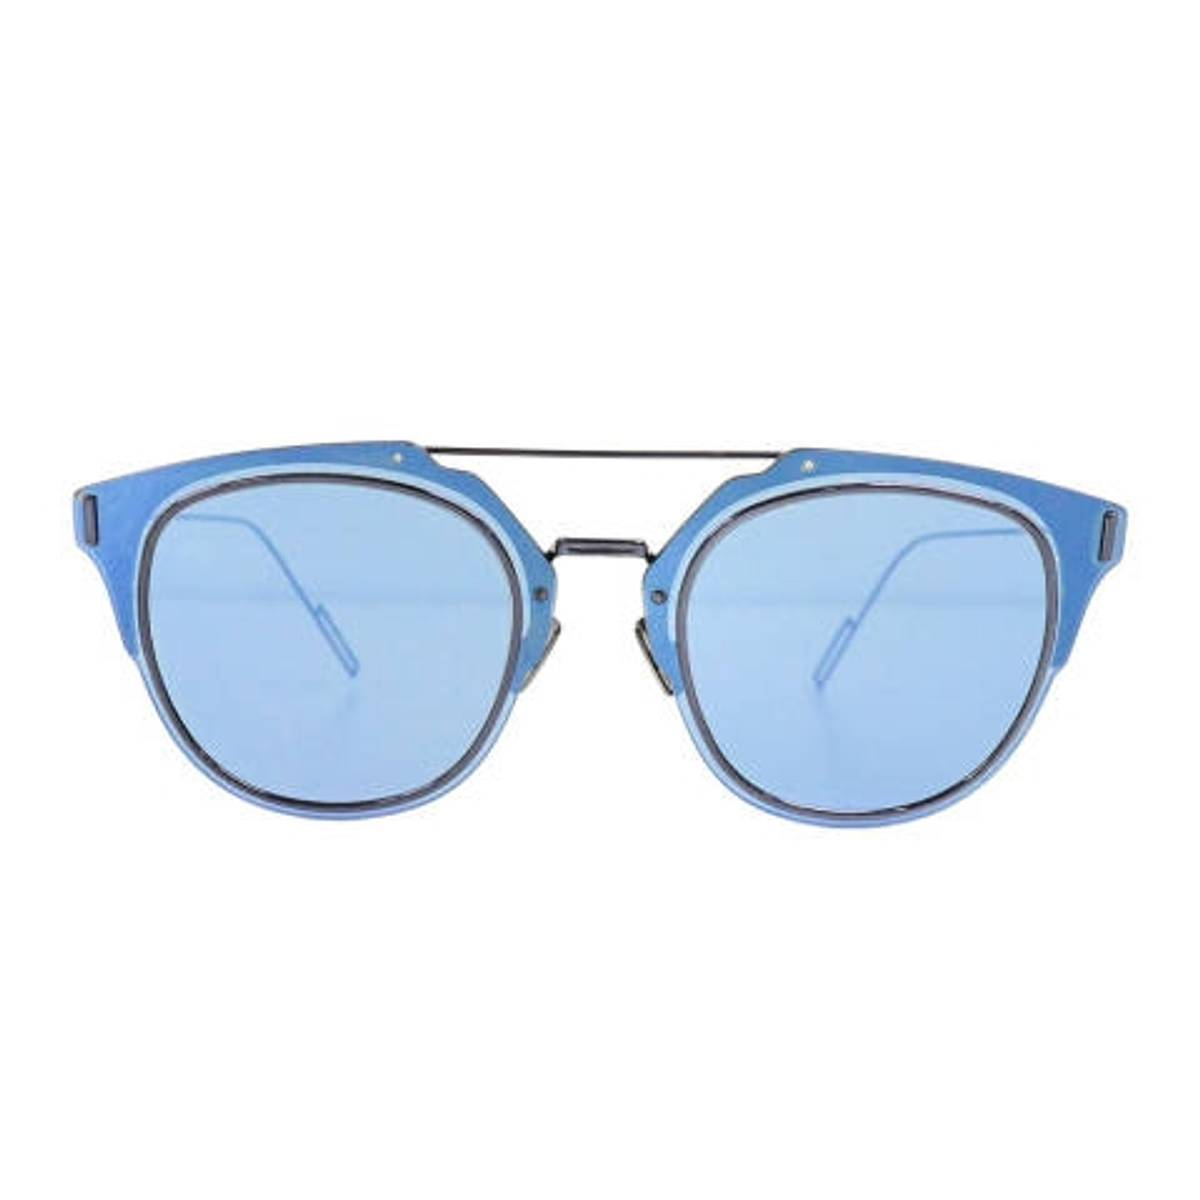 d9ba007d6d55 Dior Sunglasses Navy Composit Mirror Frame Composite Eyewear